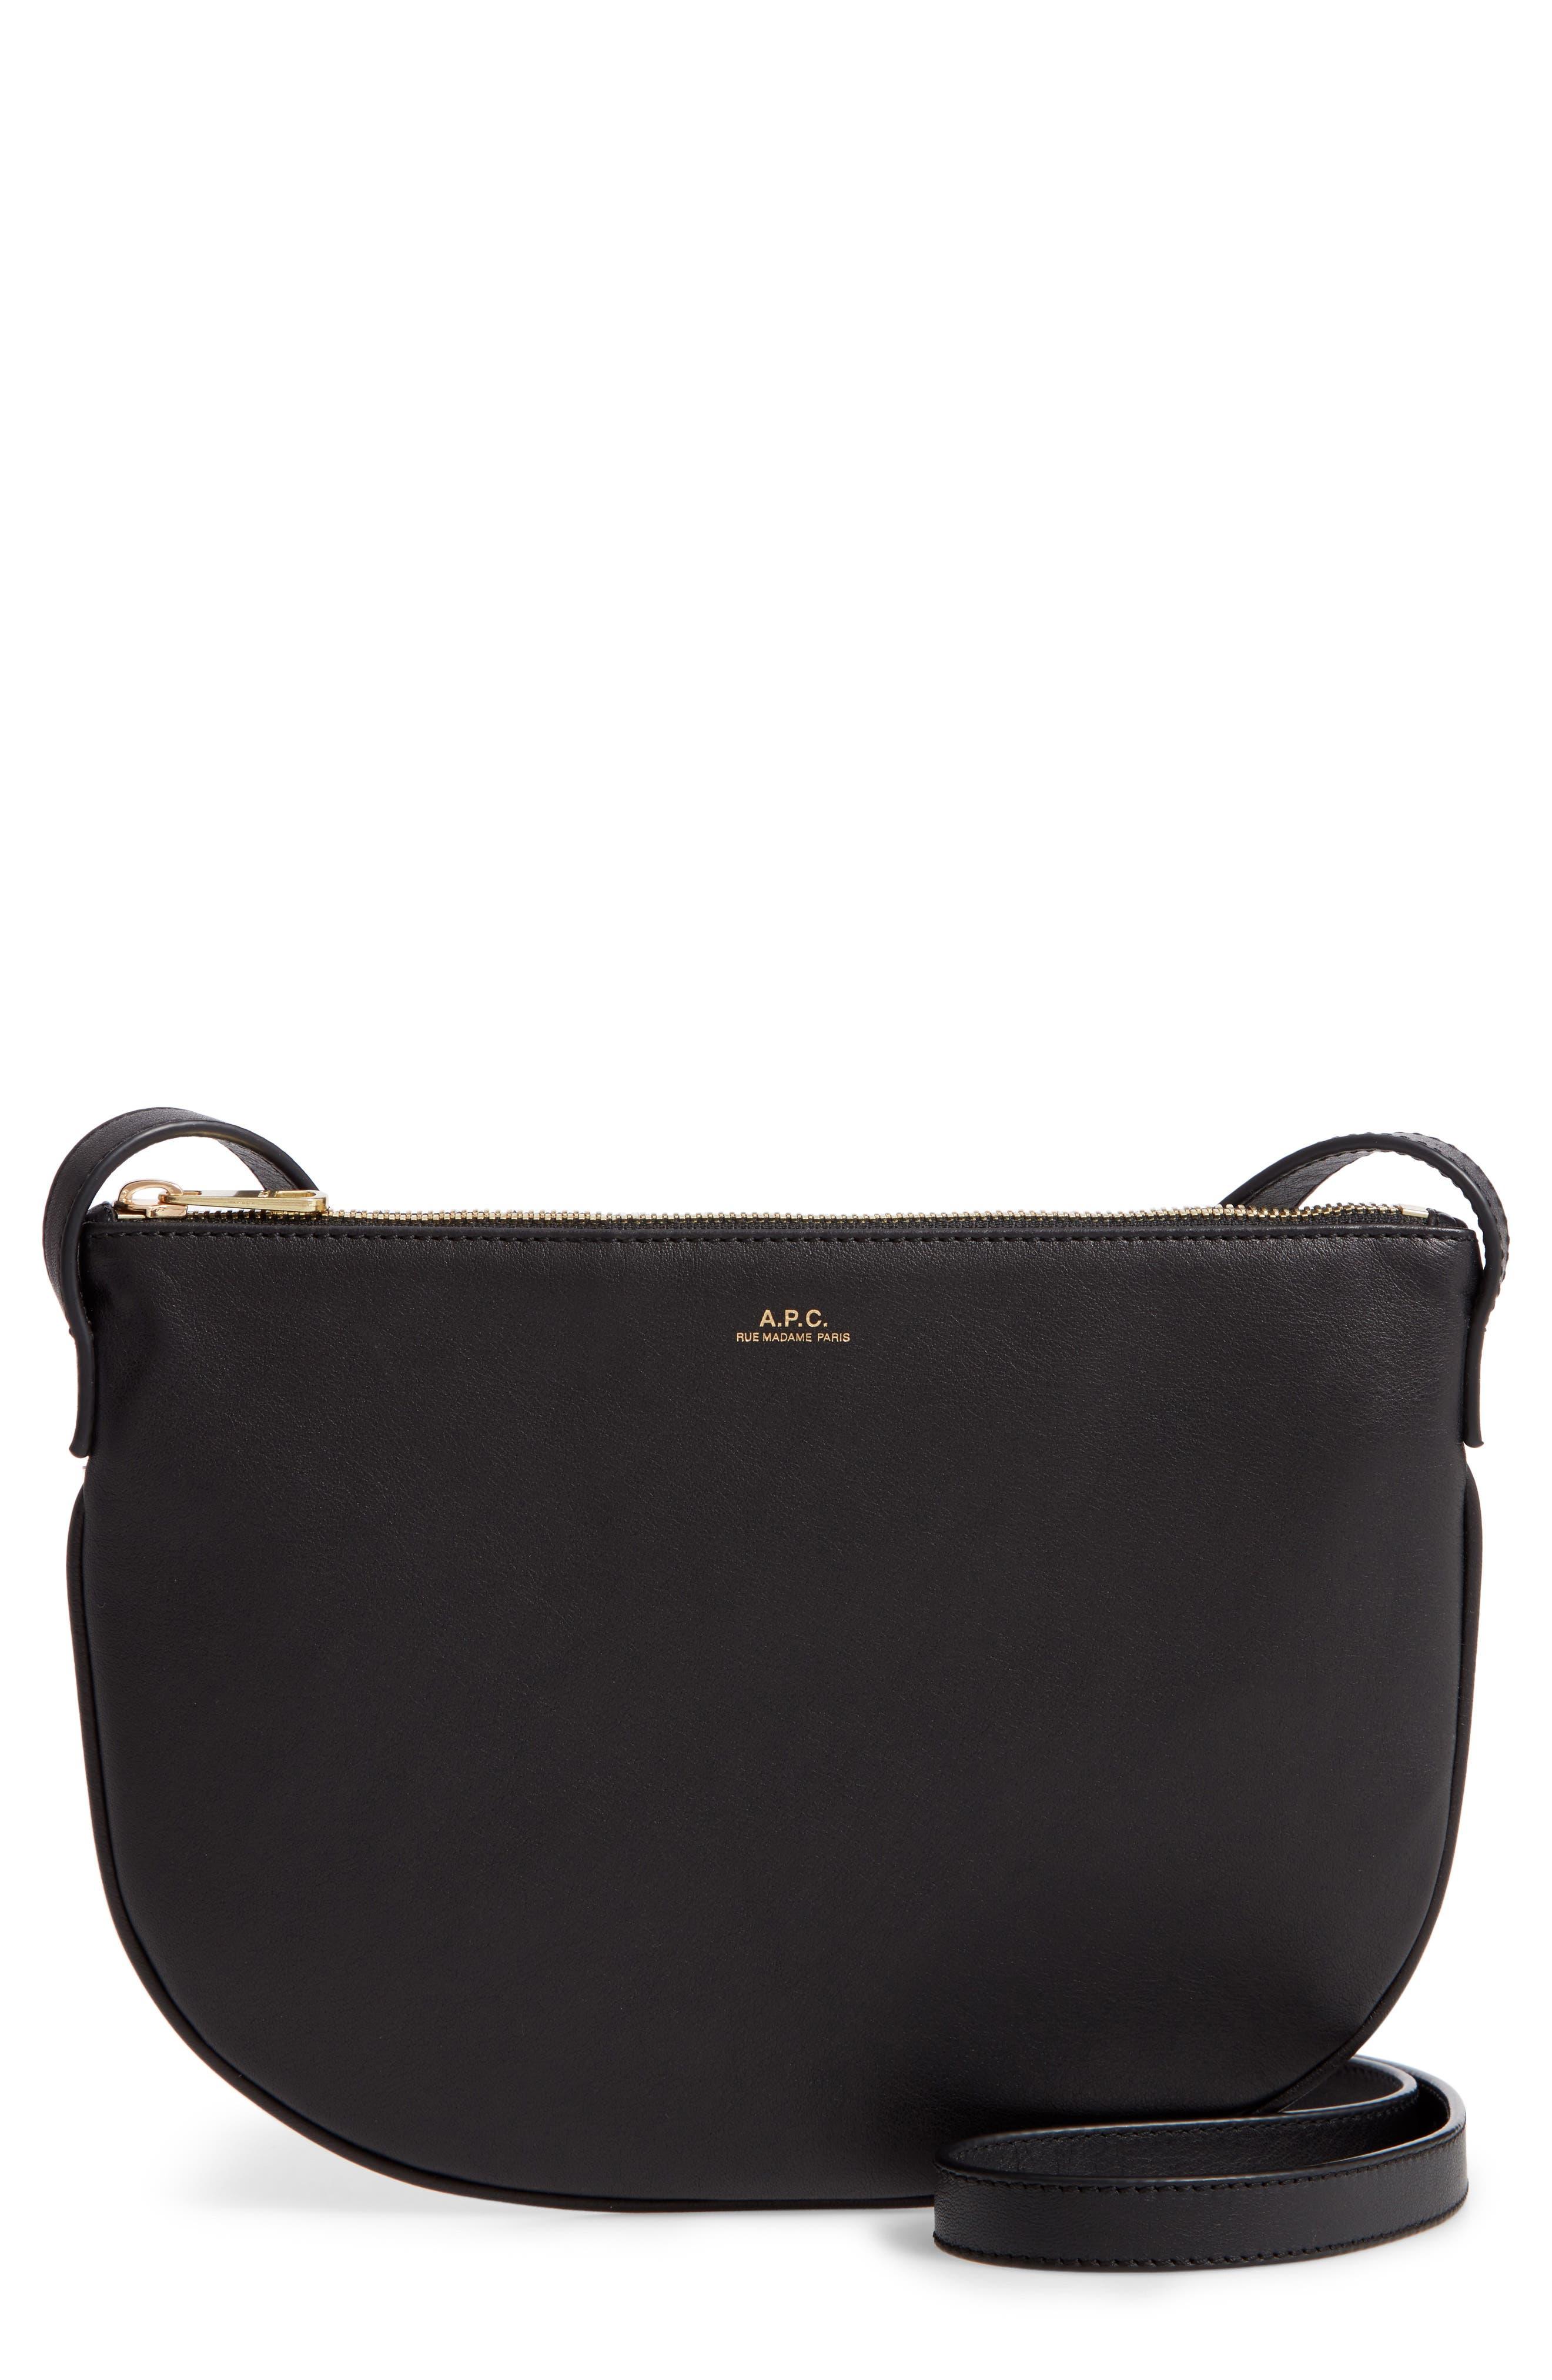 A.P.C. Sac Maelys Leather Crossbody Bag, Main, color, LZZ NOIR